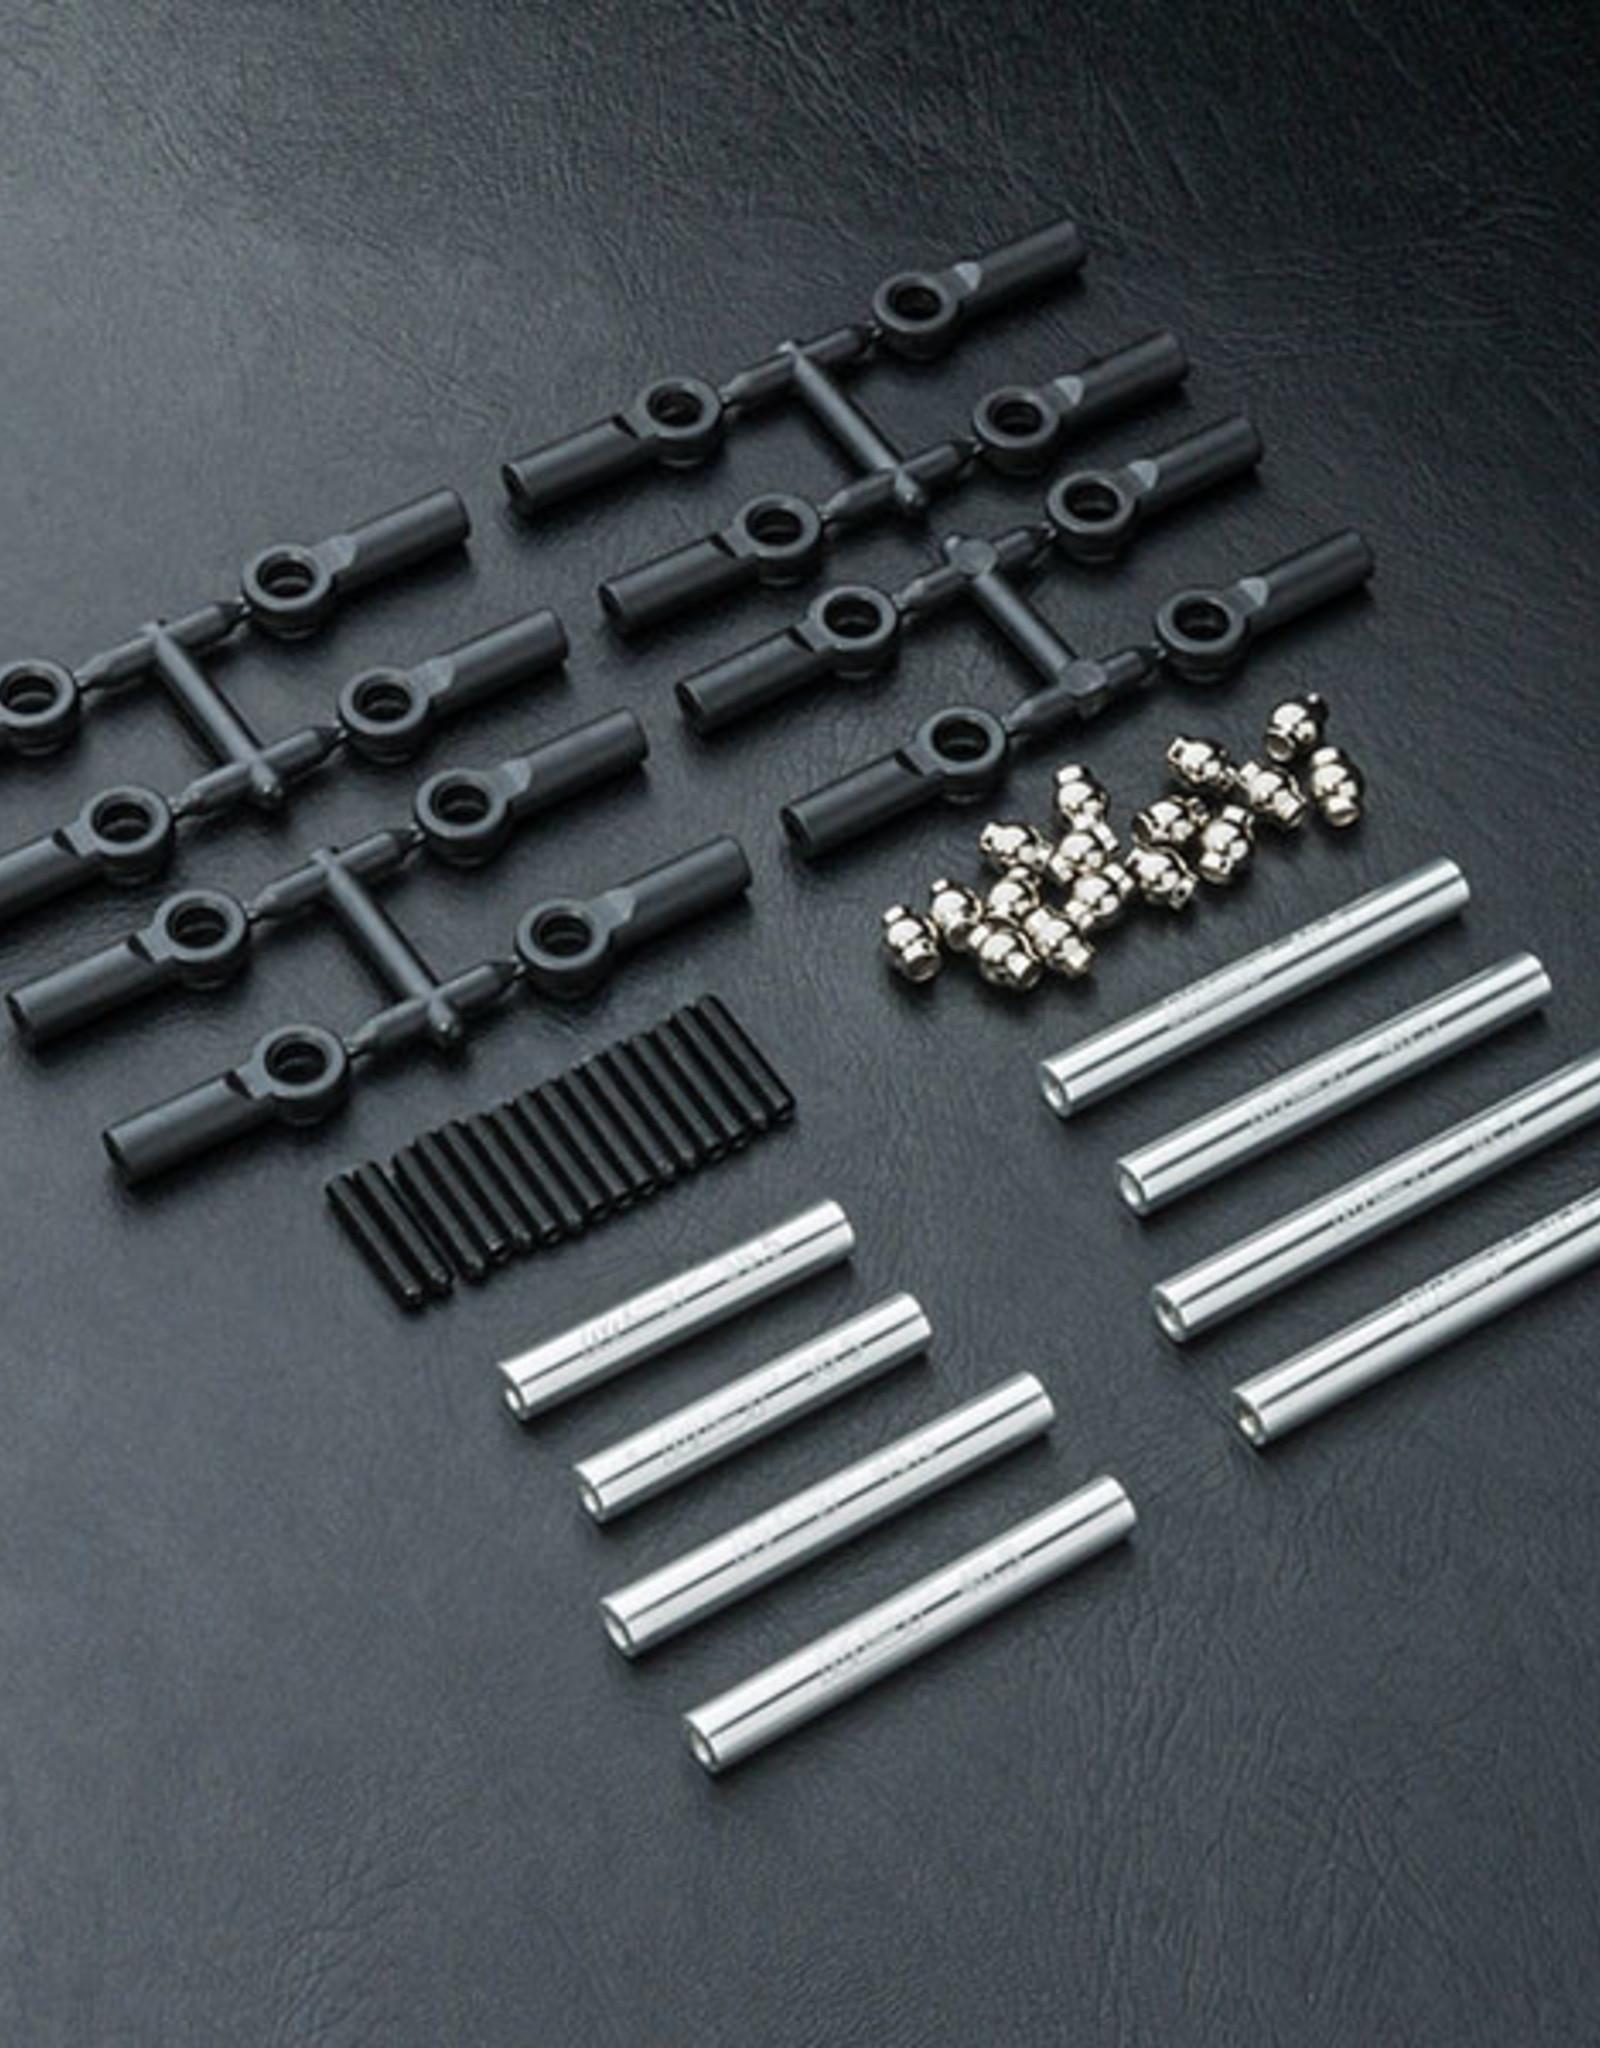 MST MXSPD210537S CMX Alum. link set (252mm) (silver) 210537S by MST